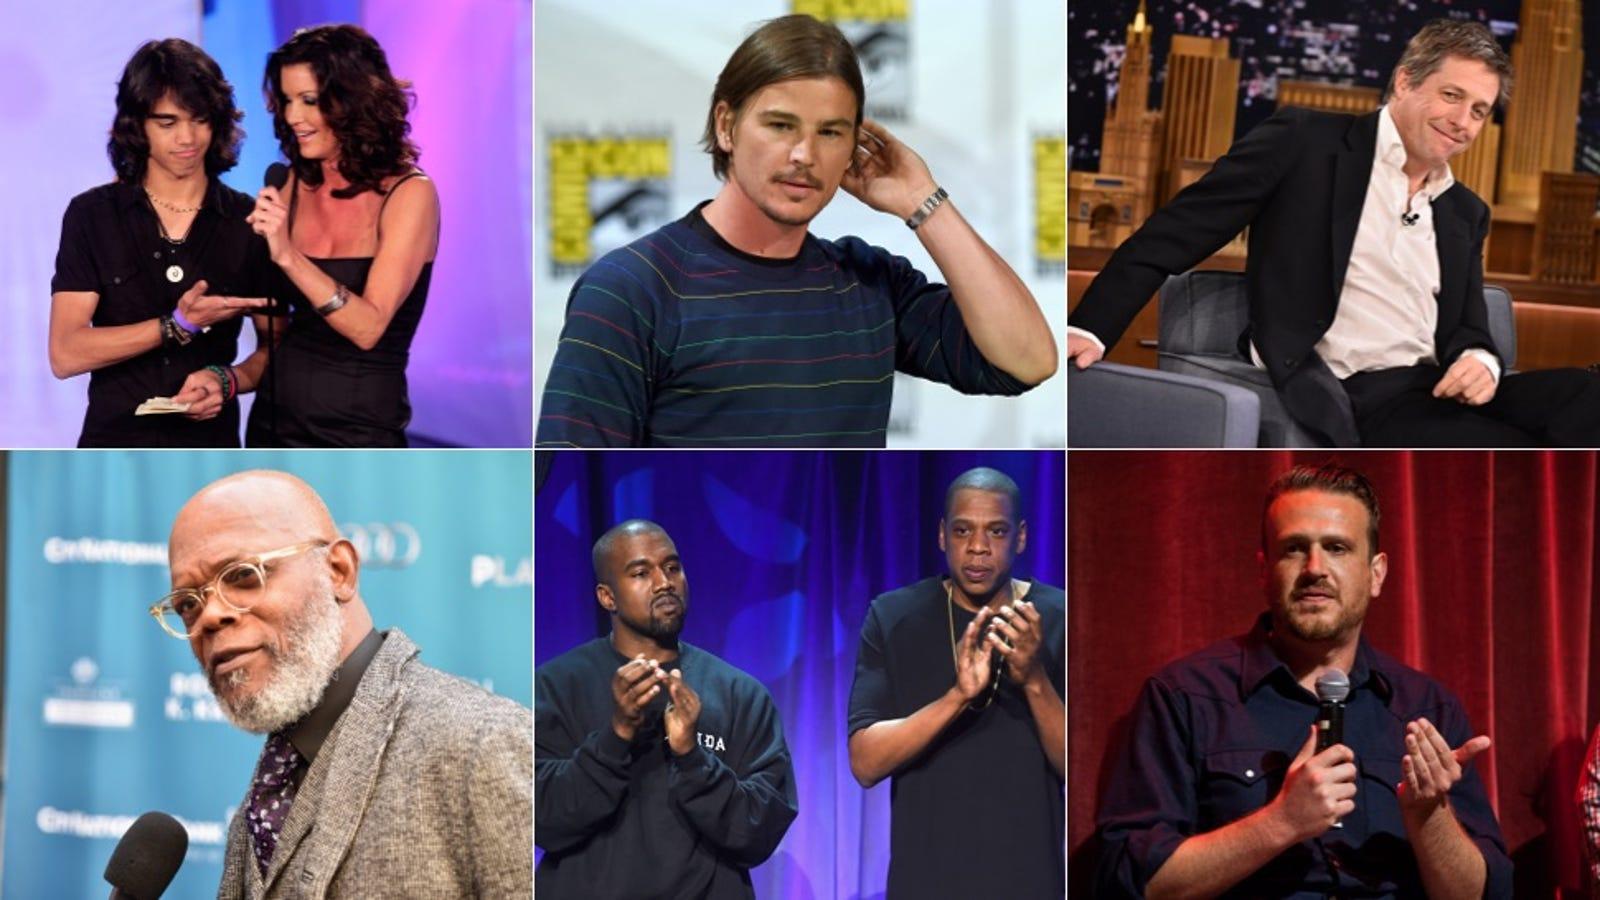 The 19 Rudest Celebrity Encounter Stories Ever - Suggest.com